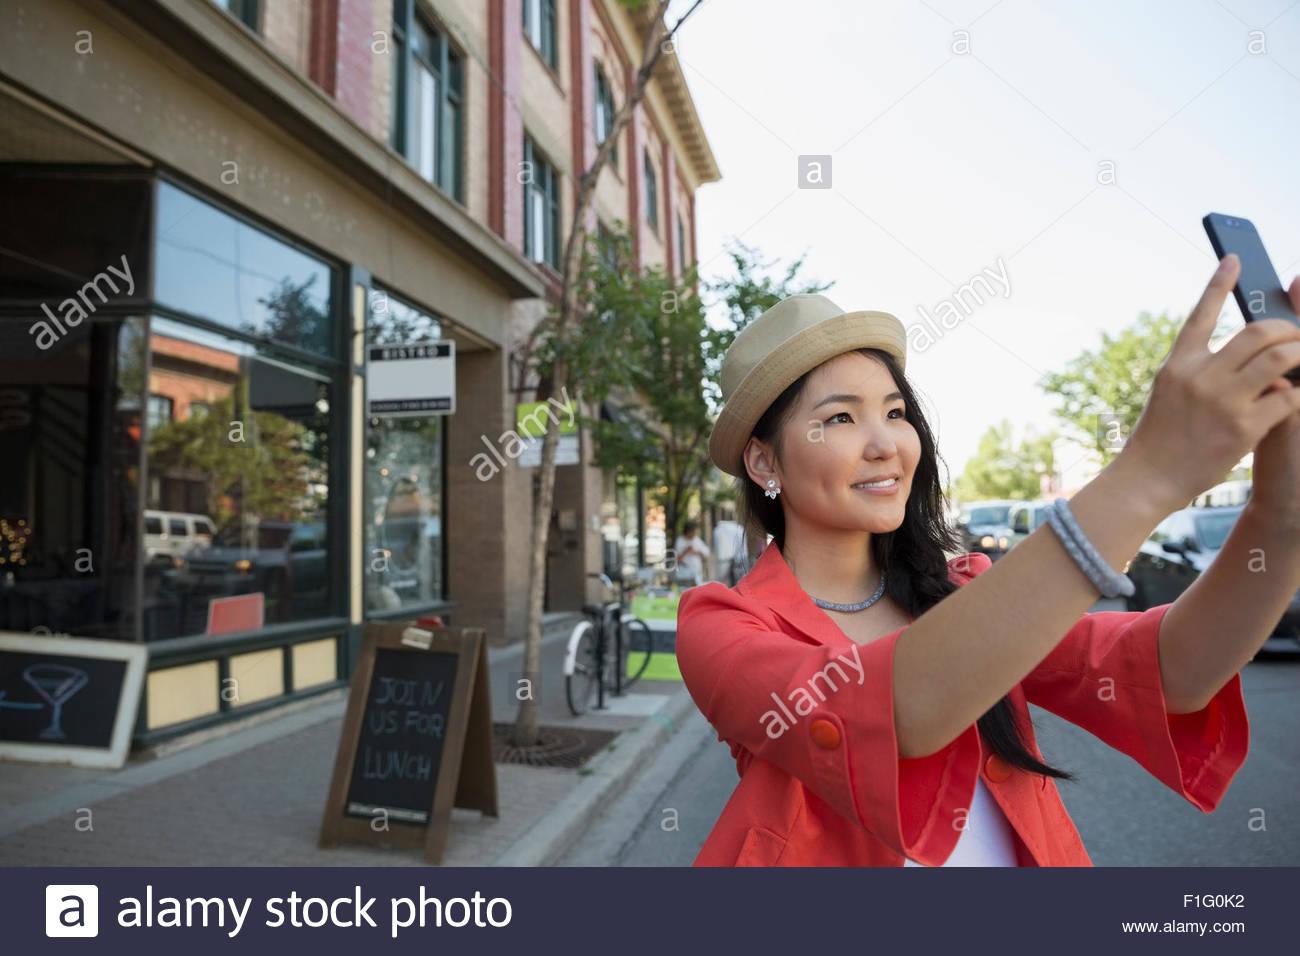 Smiling woman in hat taking selfie on urban street Stock Photo